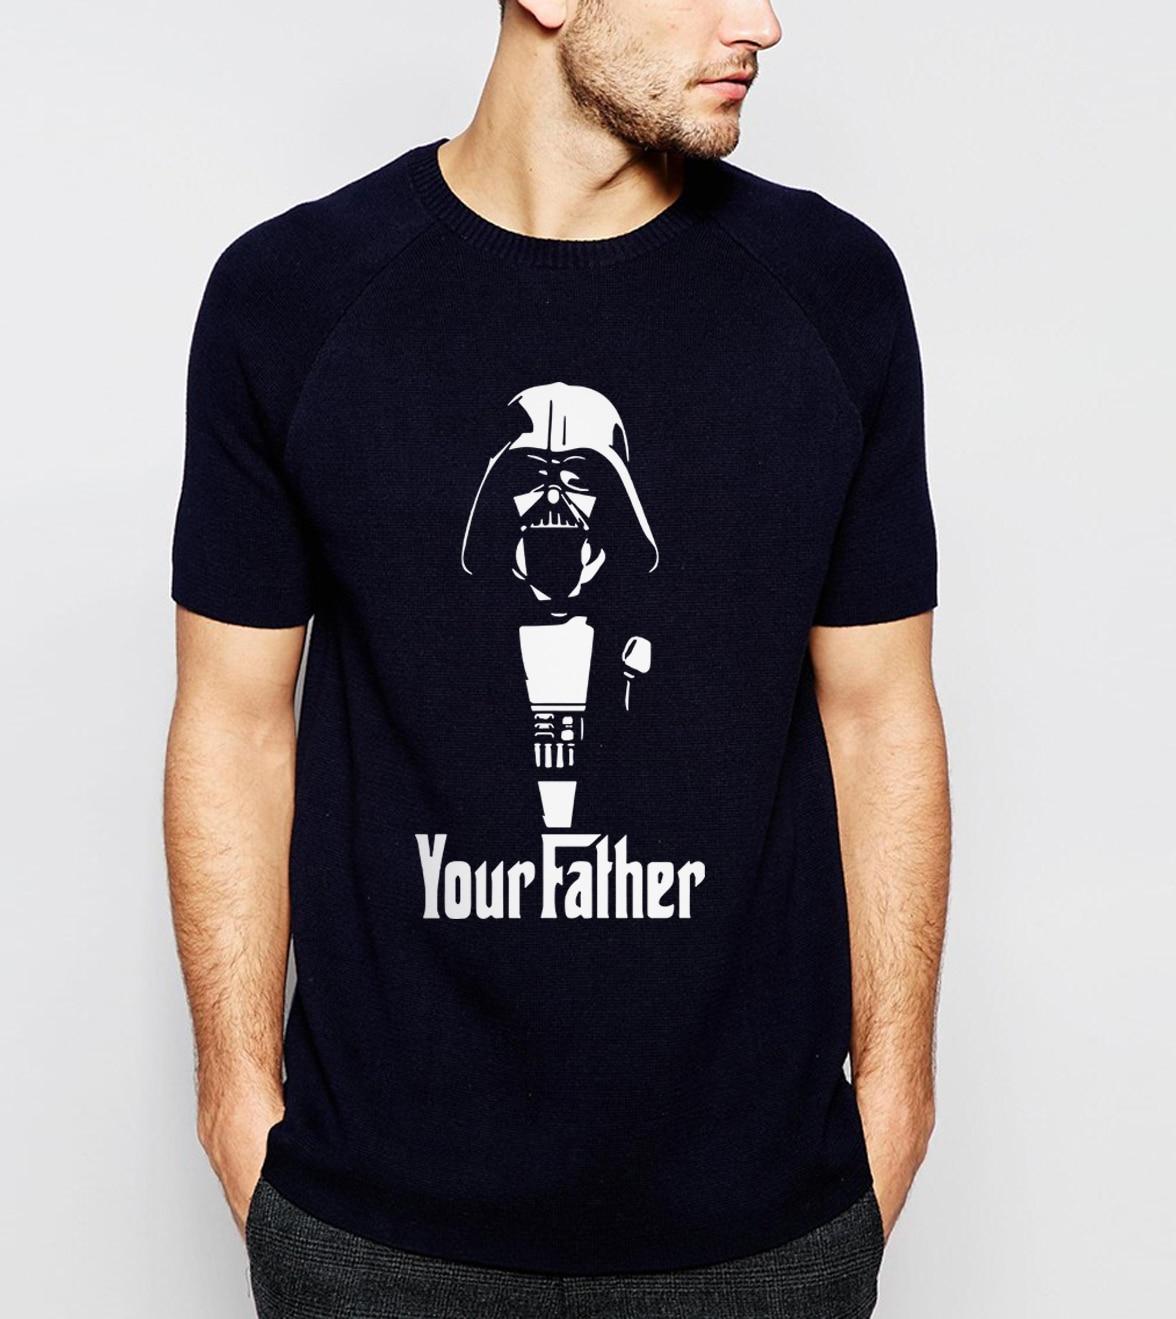 Star Wars Yoda/Darth Vader T-shirt 2019 Summer Casual Cartoon Men T Shirt Short Sleeve O-Neck 100% Cotton Camiseta Masculino